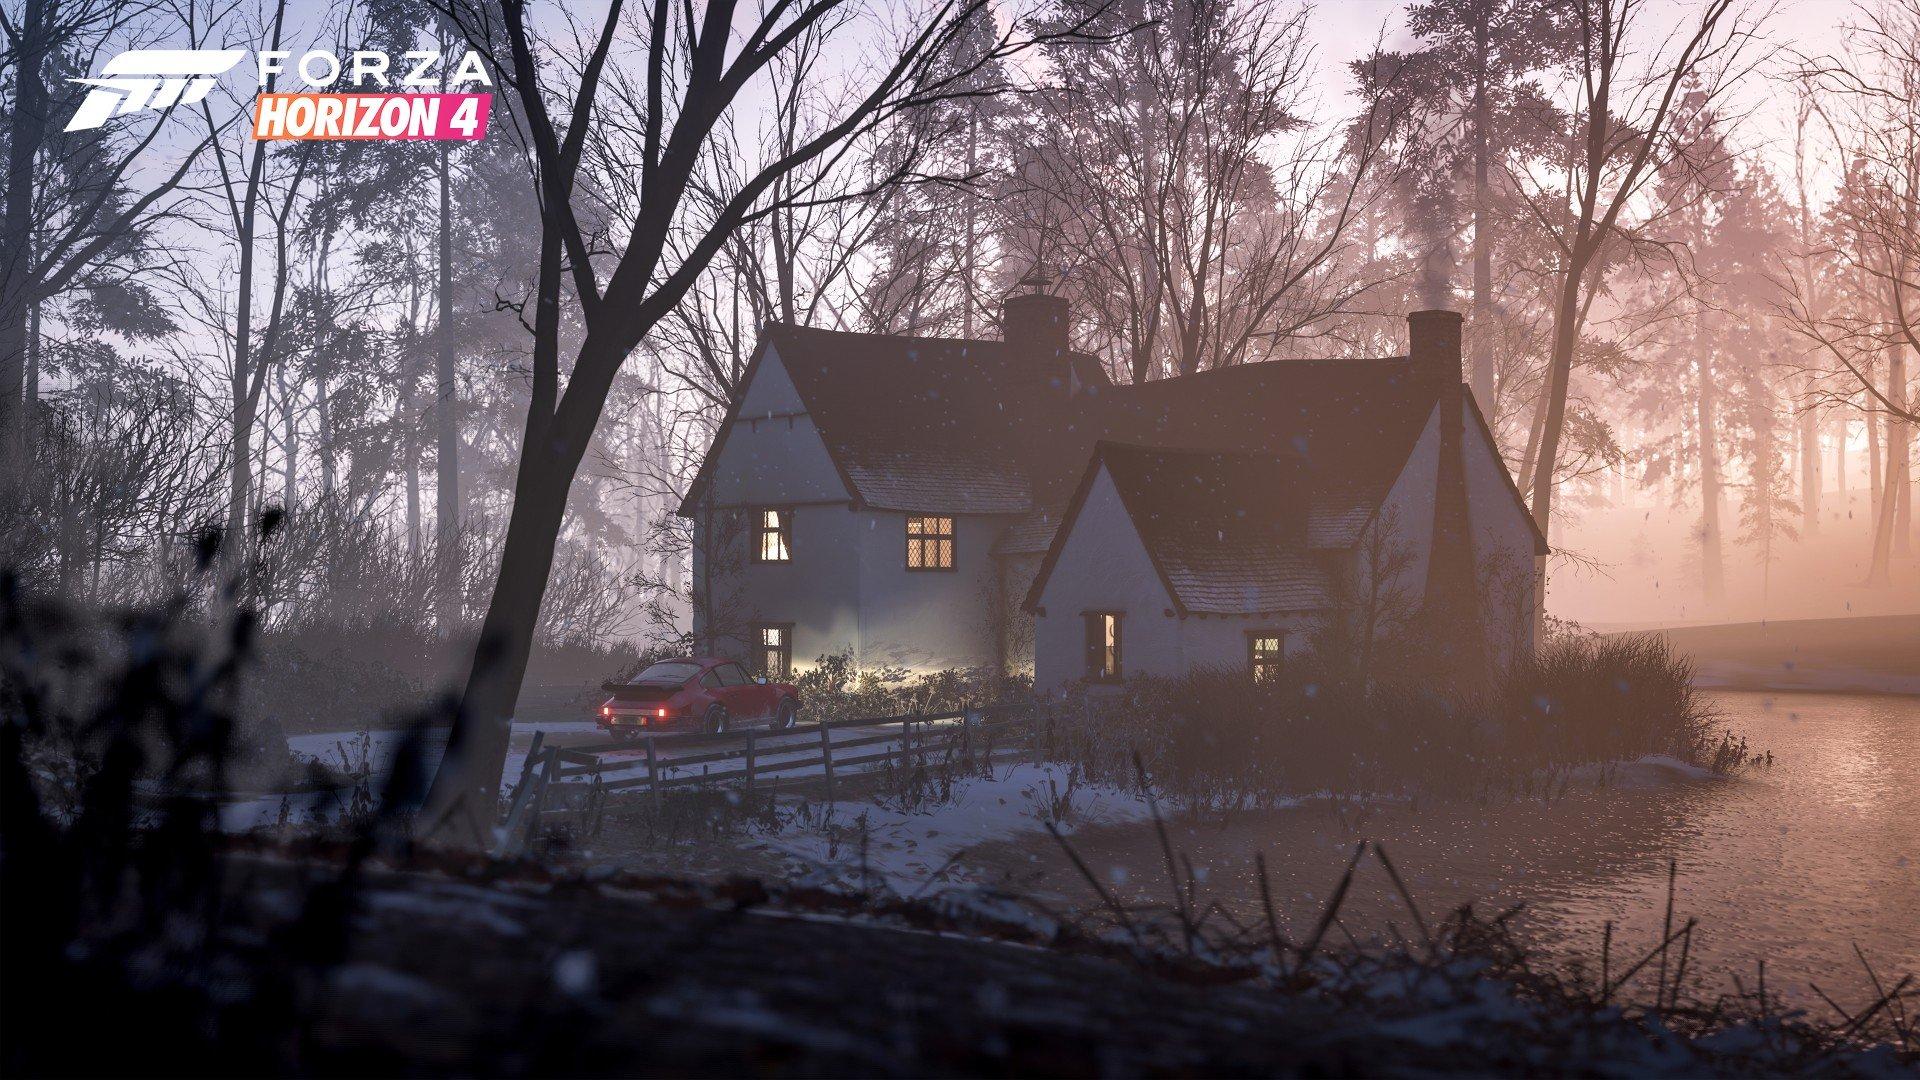 Forza Horizon 4 Demo Crashed on Startup Forza-Horizon-4_Winter-House-1.jpg